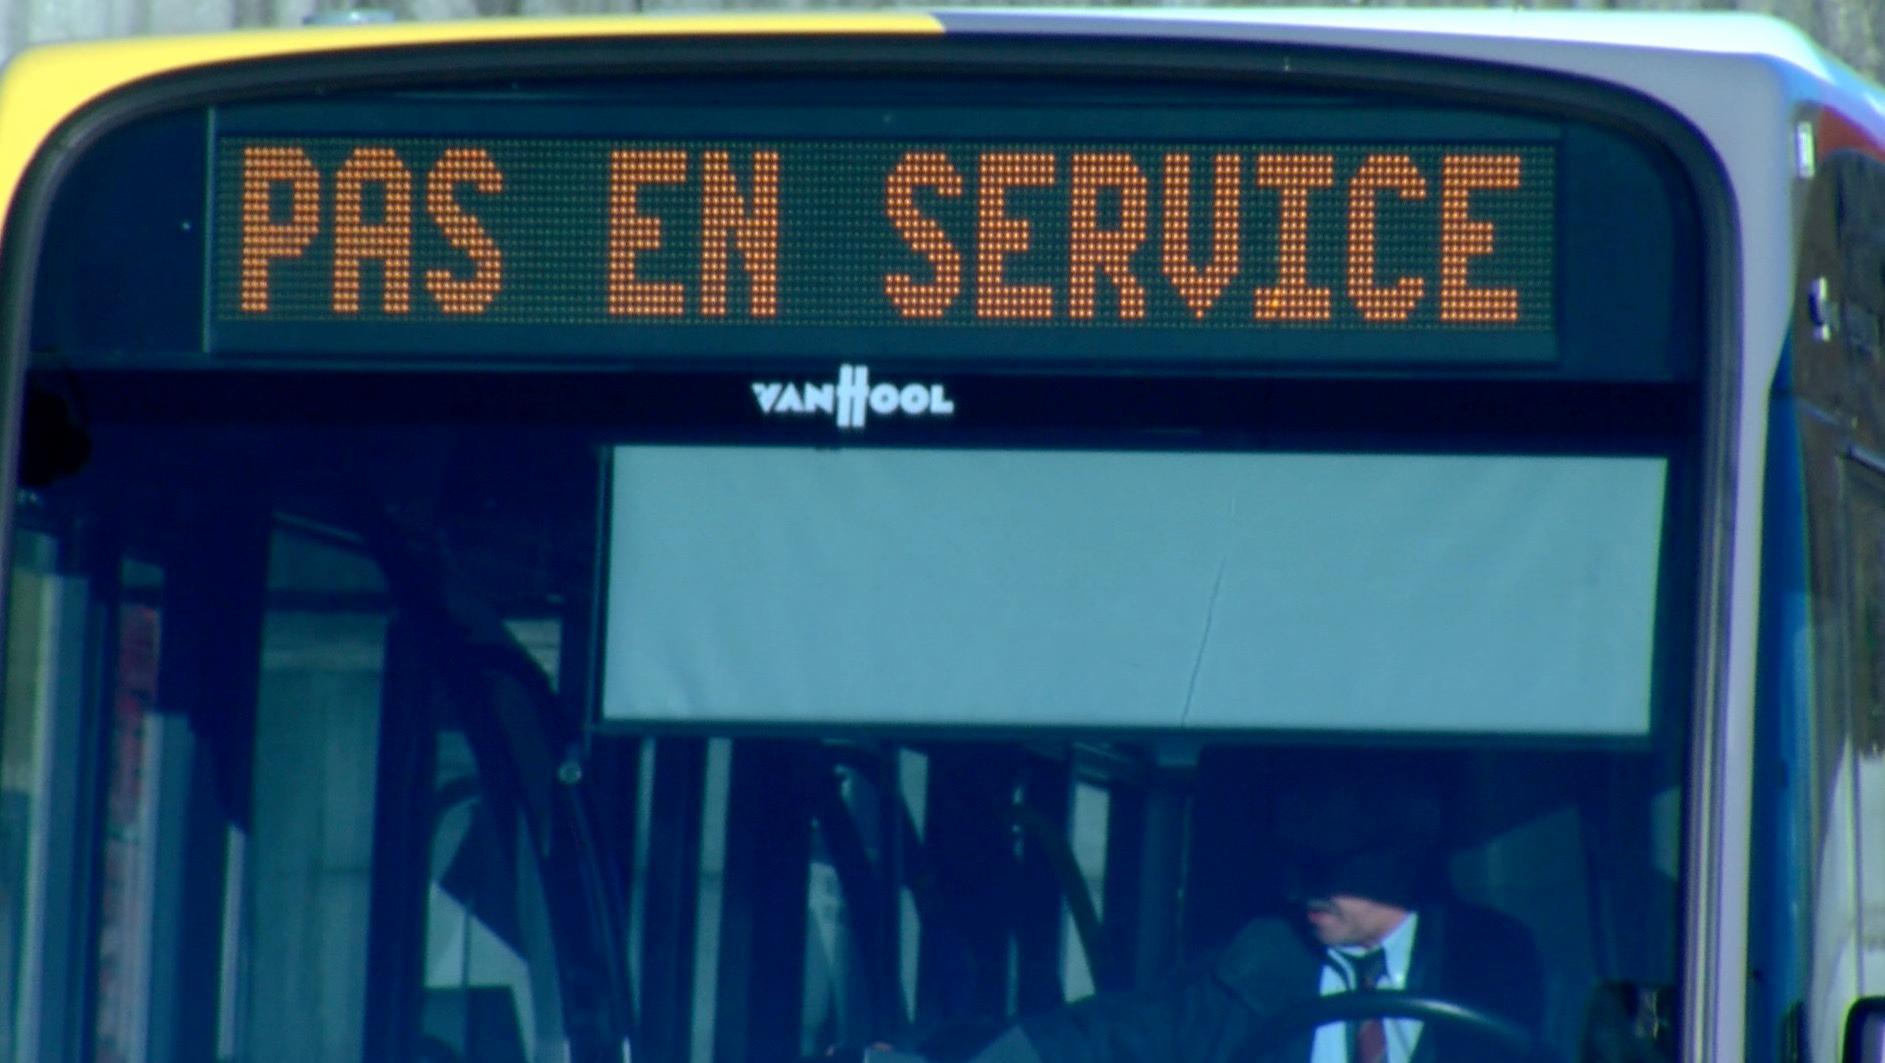 Grève: 3/4 des bus circulent en Wallonie picarde